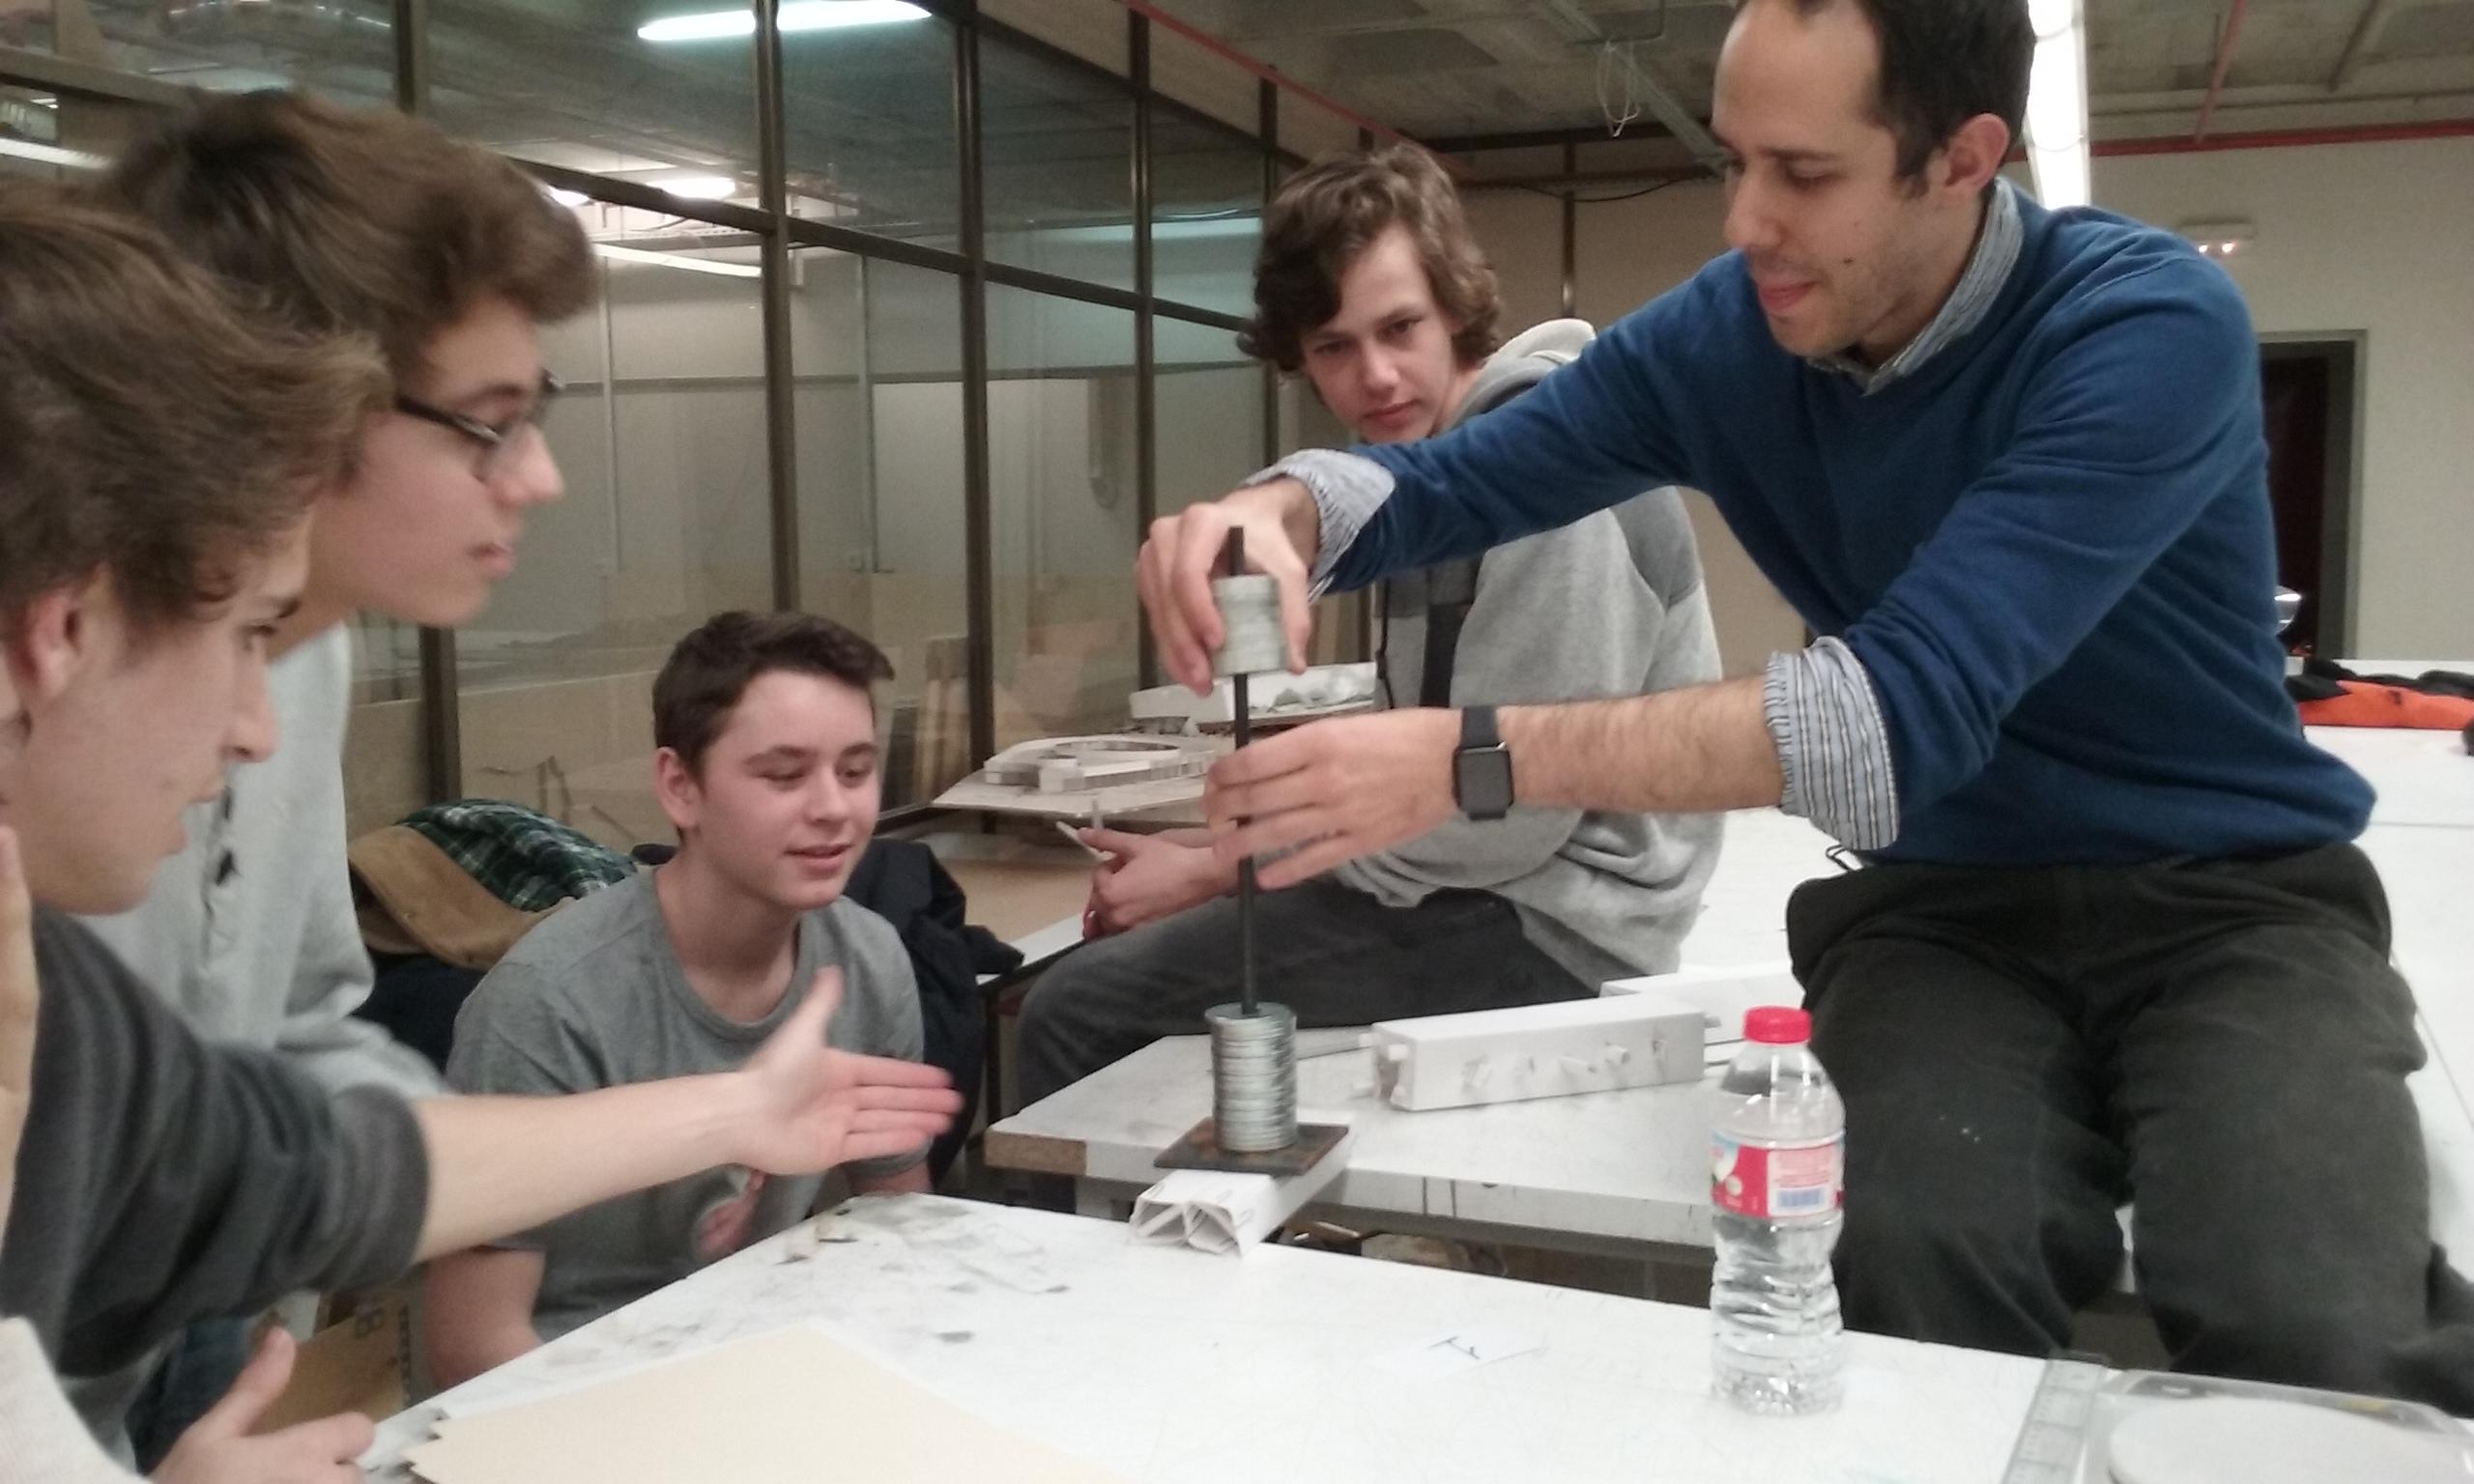 Pr cticas en la escuela de arquitectura fert batxillerat for Practicas estudio arquitectura